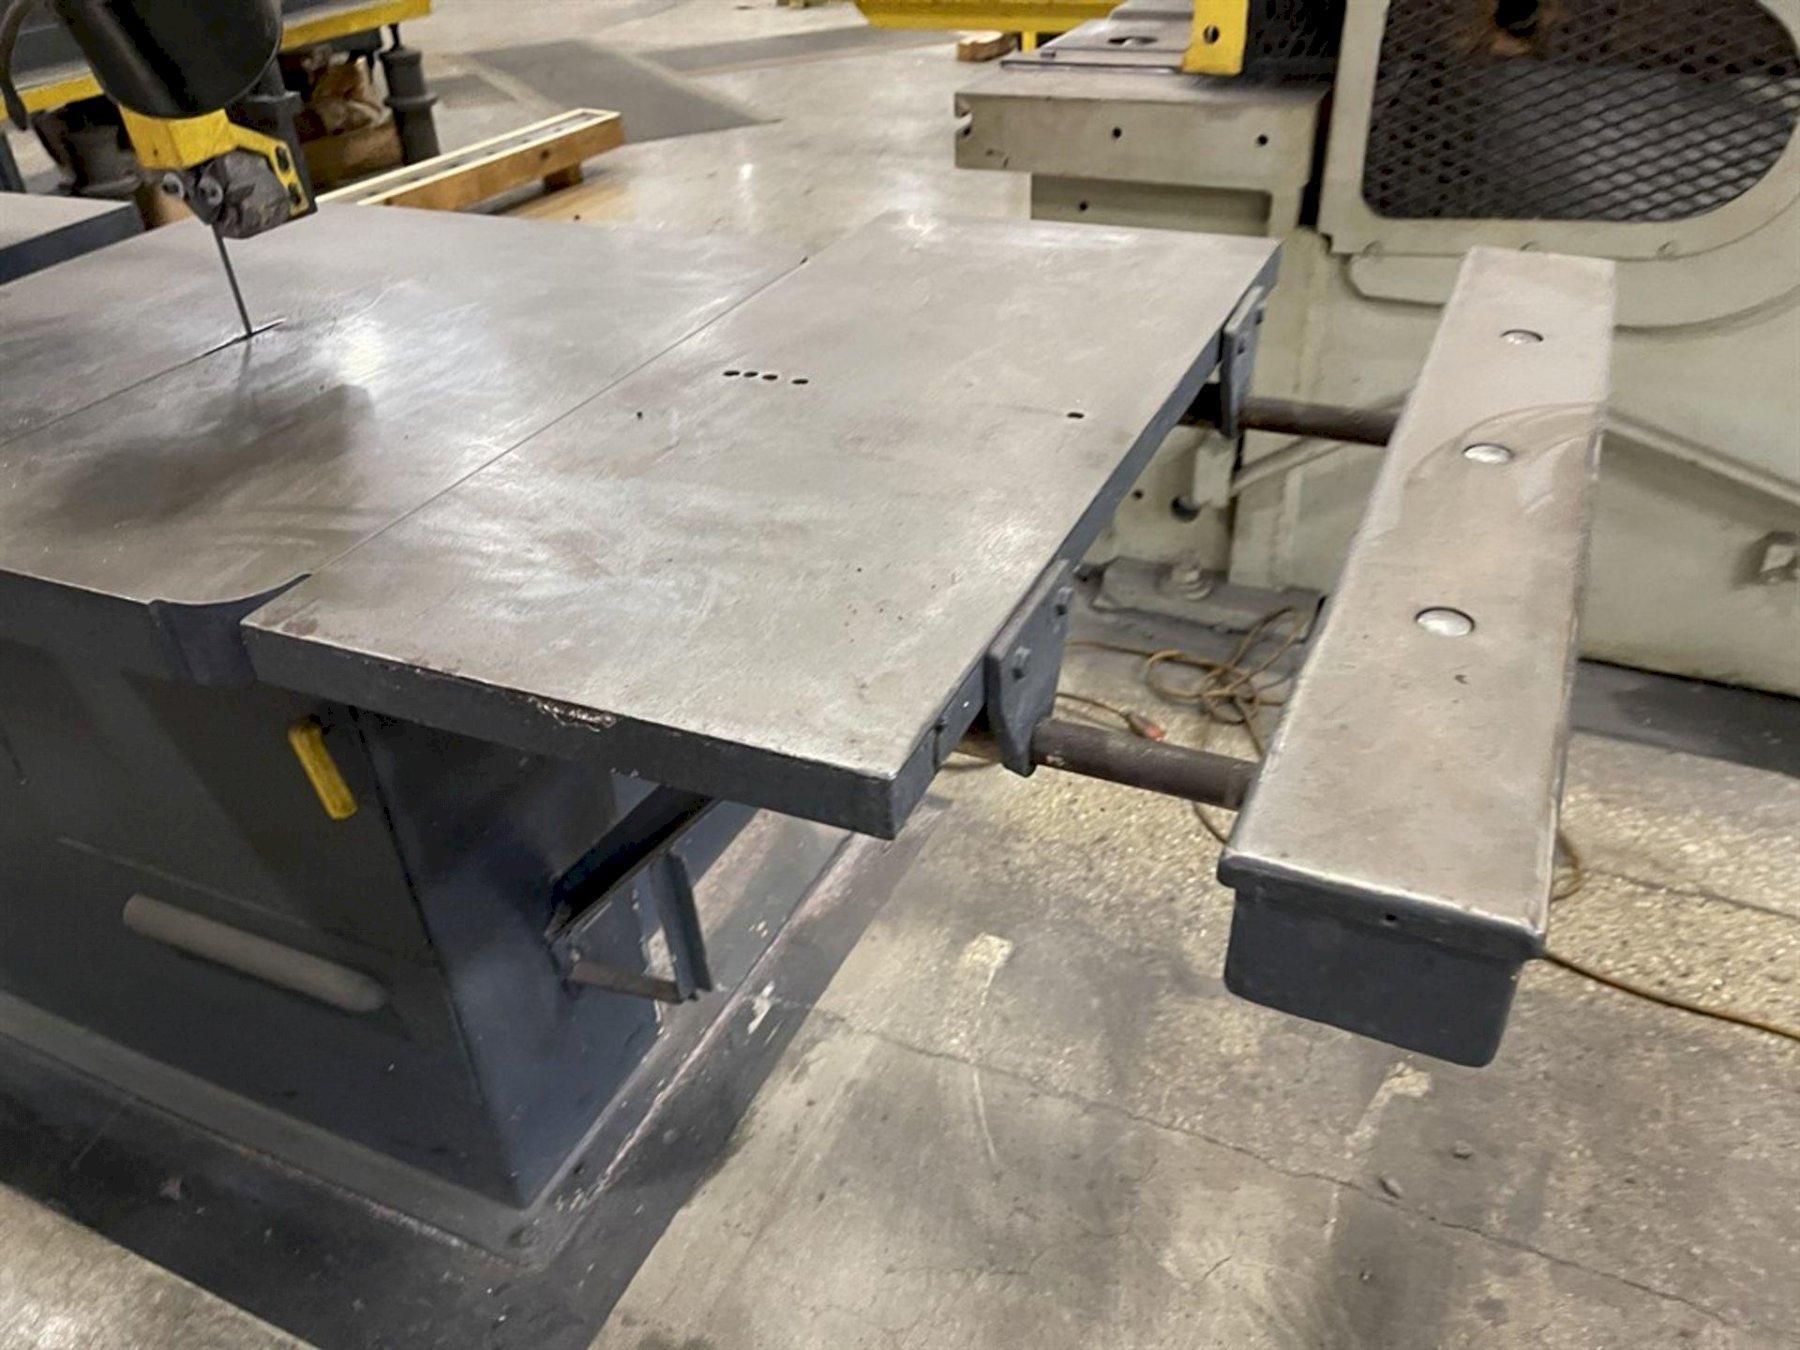 "36"" DOALL VERTICAL BAND SAW, Model 3613-20,  36"" Throat Depth, 30"" x 30"" Table, 13"" Work Height Capacity, Table Tilt L/ R."